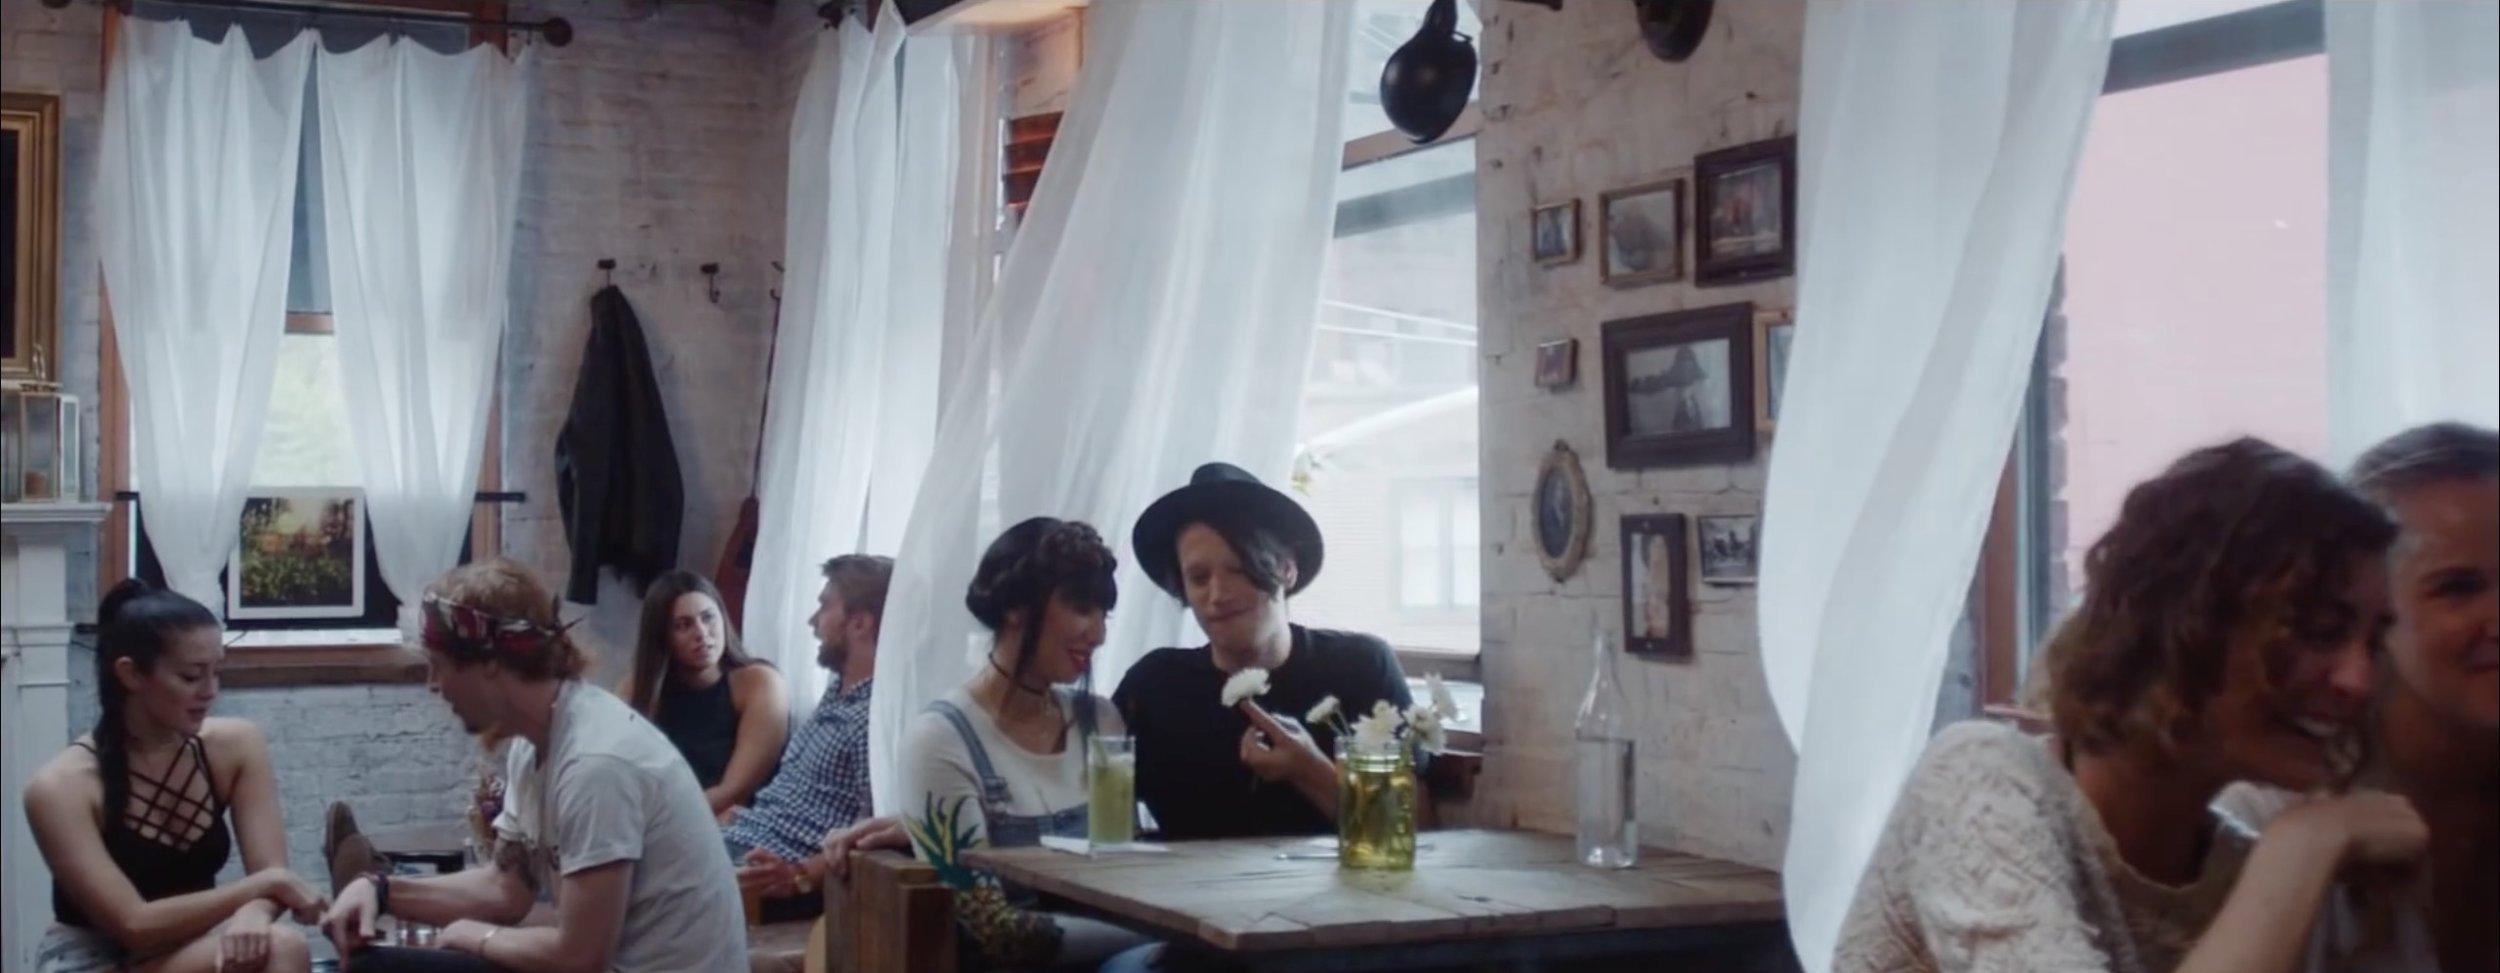 JACKIE CRUZ | COMO LA FLOR music video - Production Designer